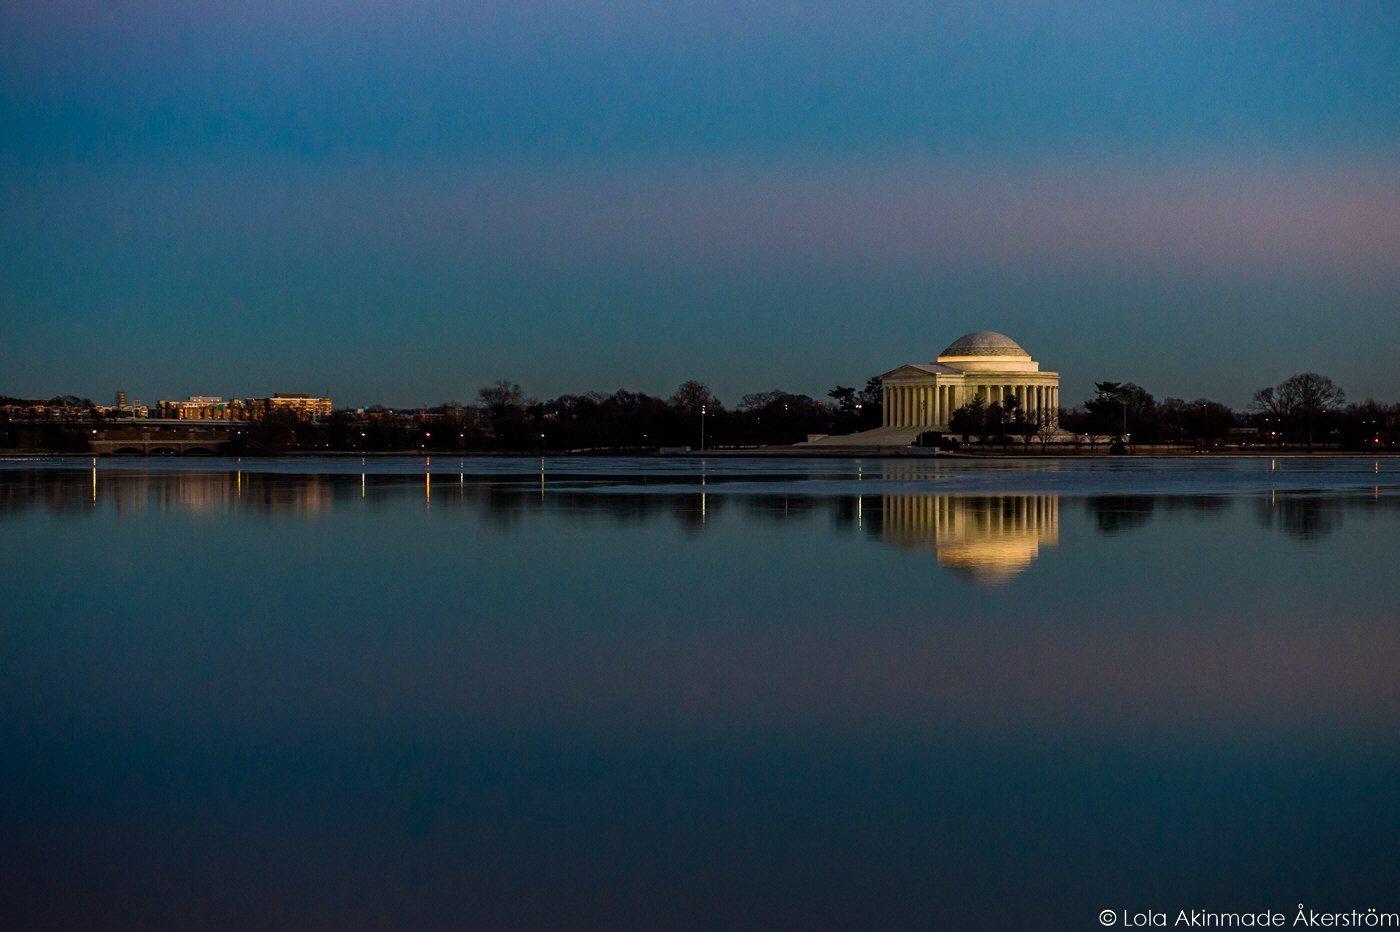 Postcard: Gearing up for Washington, D.C.